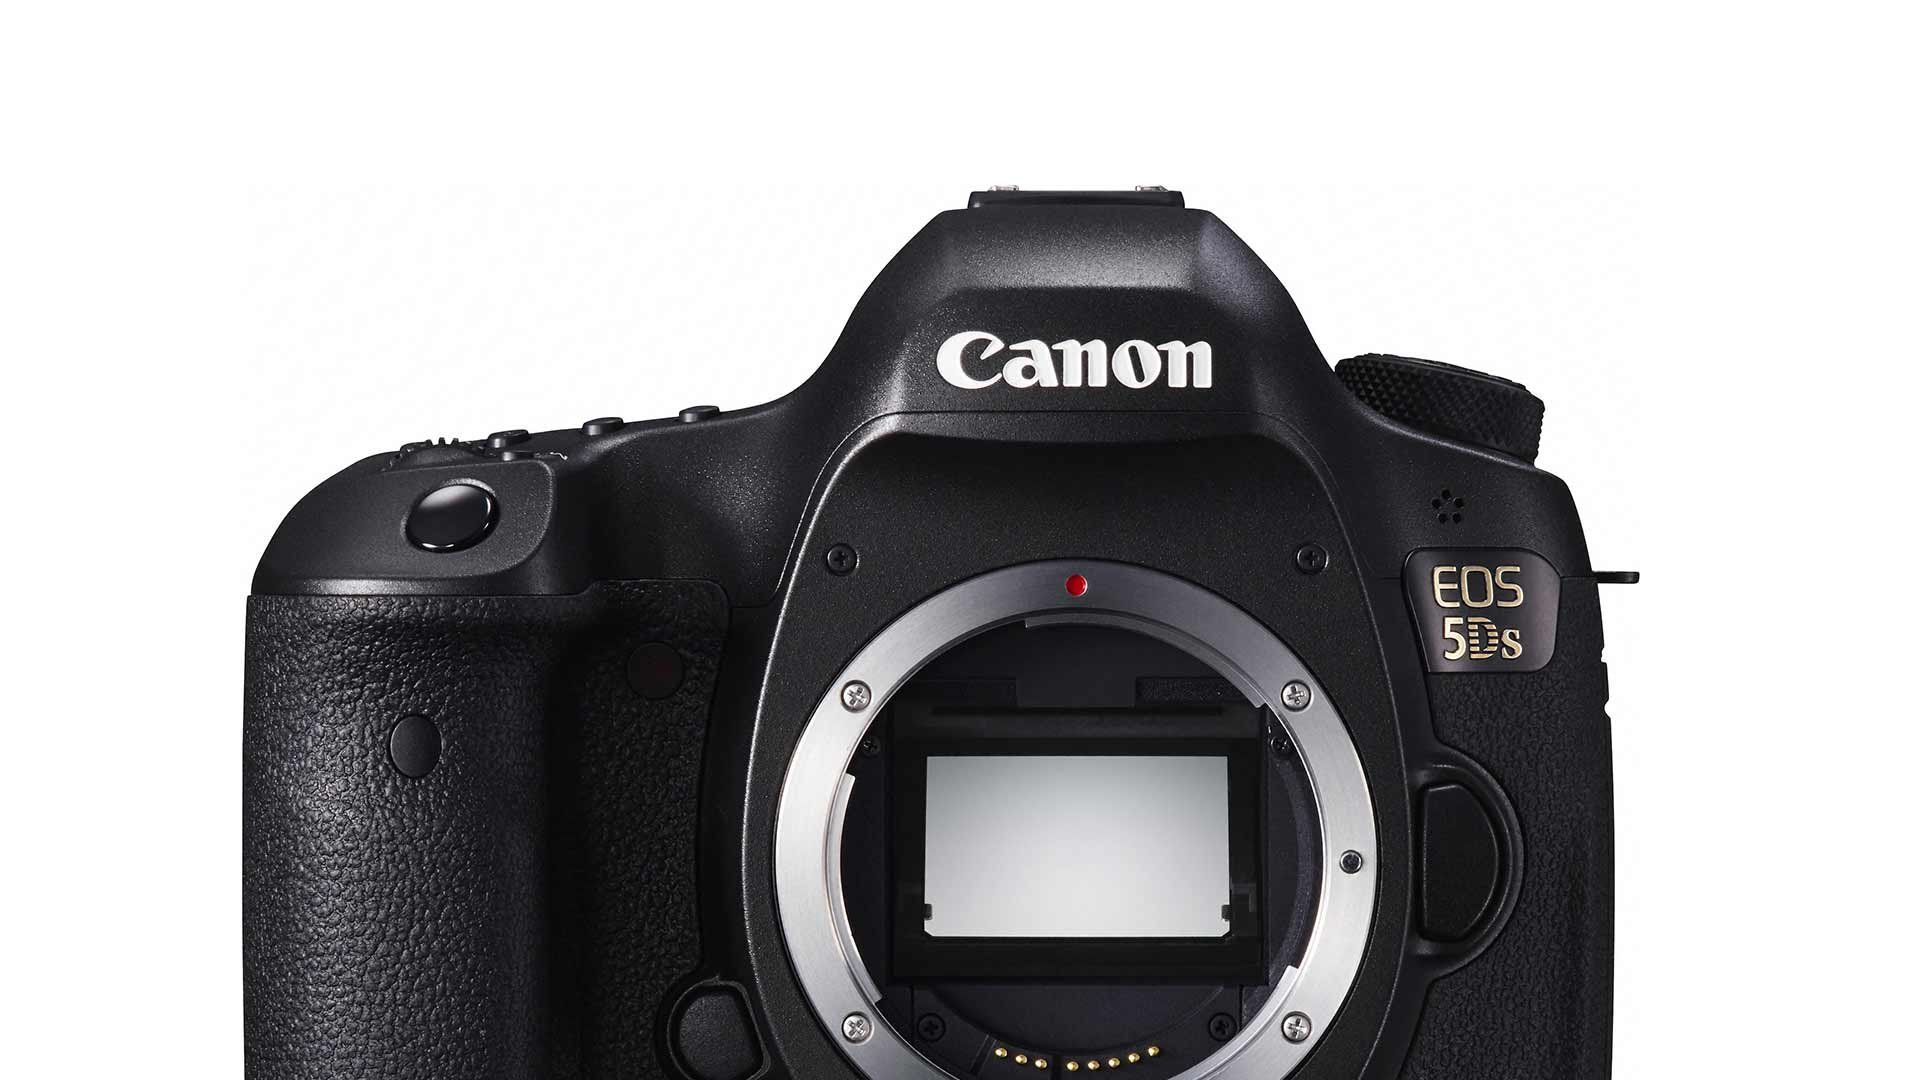 Canon Lenses Compatibility Guide Tech For Uk Eos 100d Dslr Camera 5ds